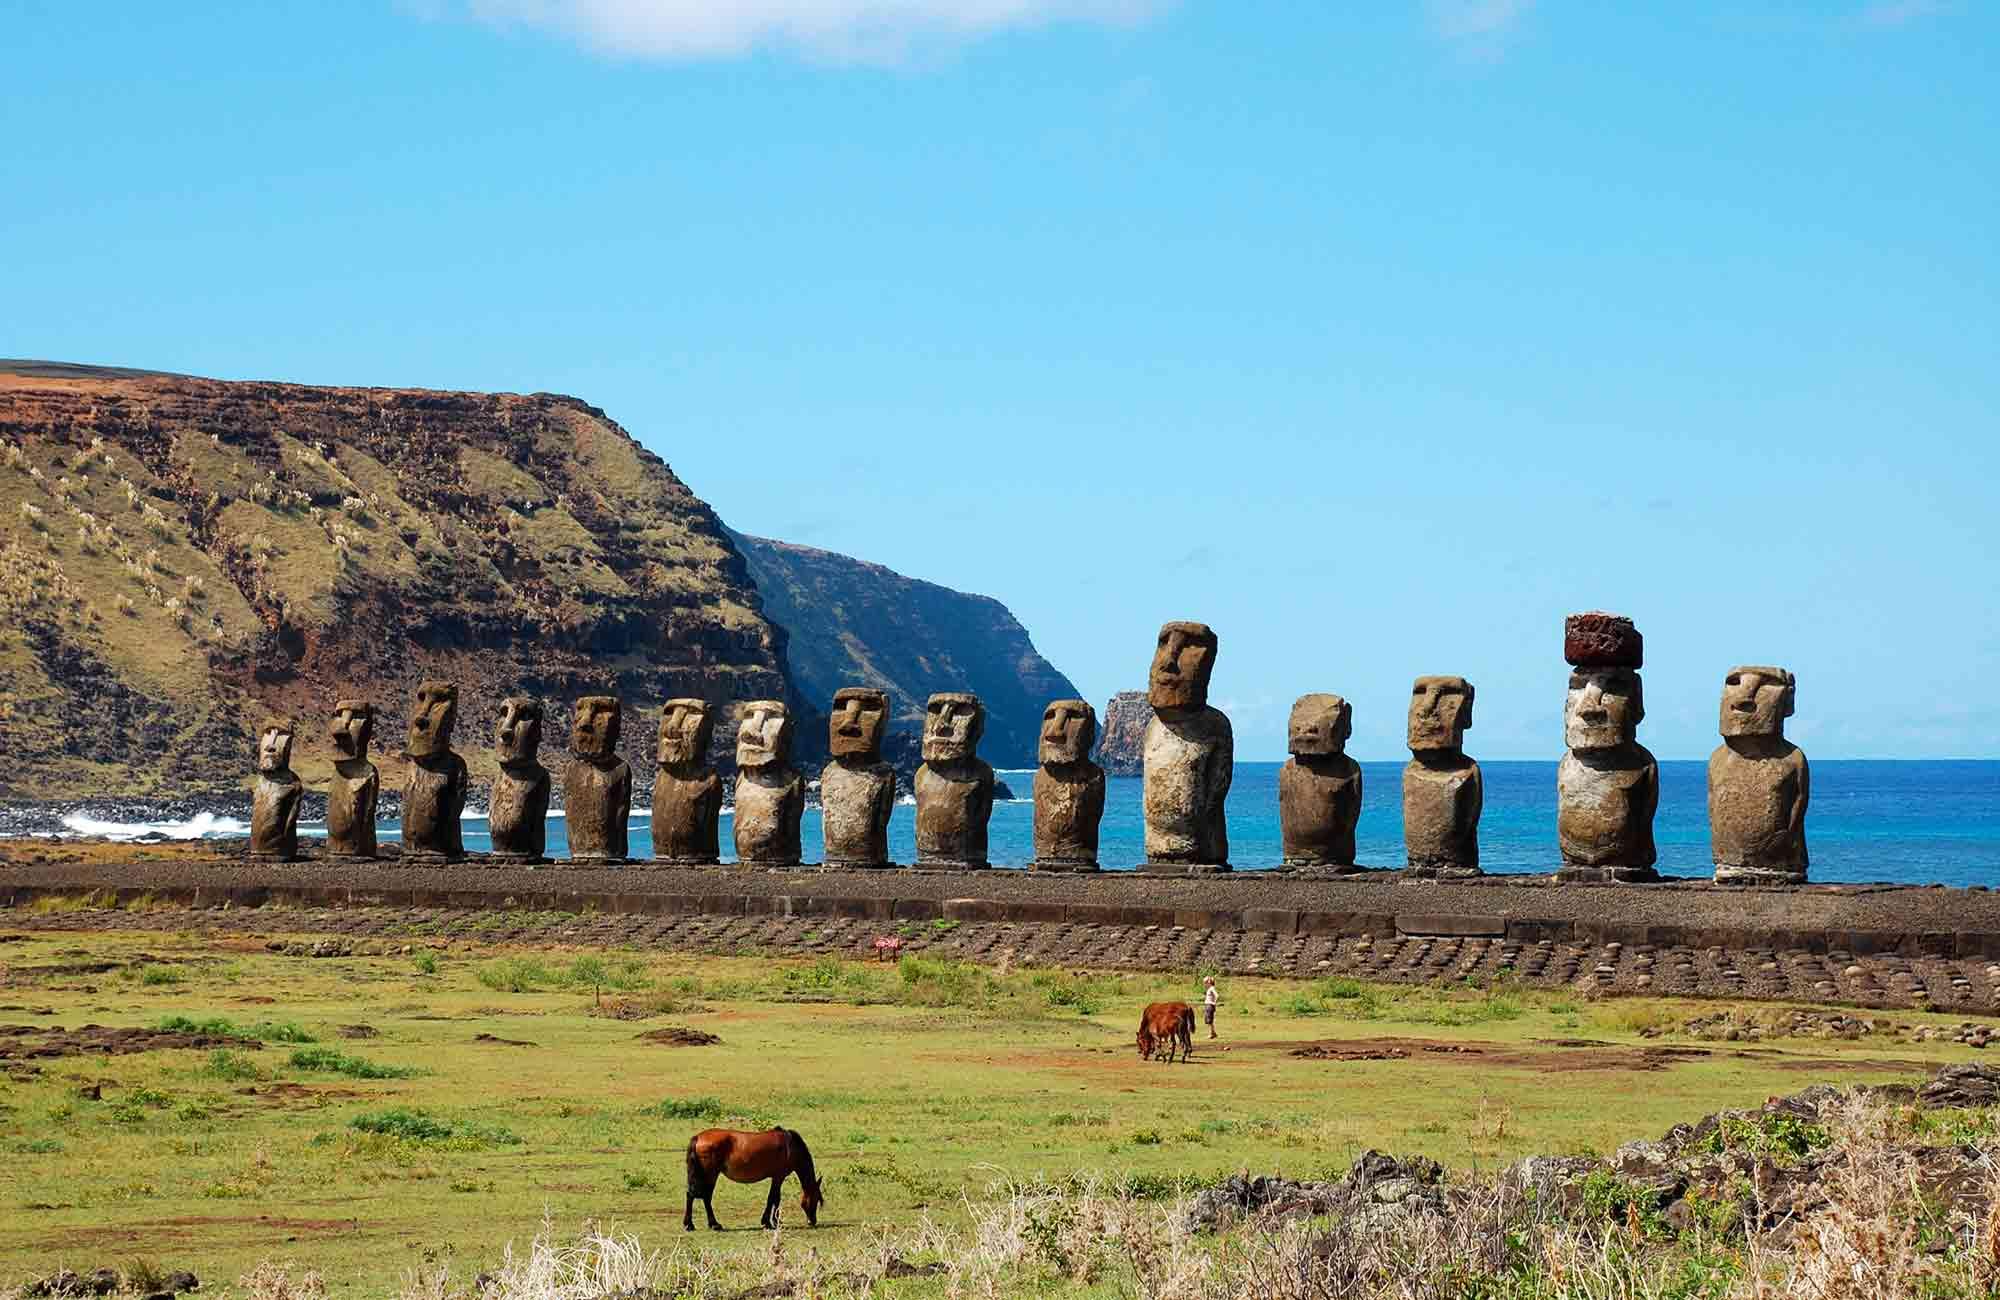 Voyage Ile de Pâques - Ahu Tongariki - Amplitudes